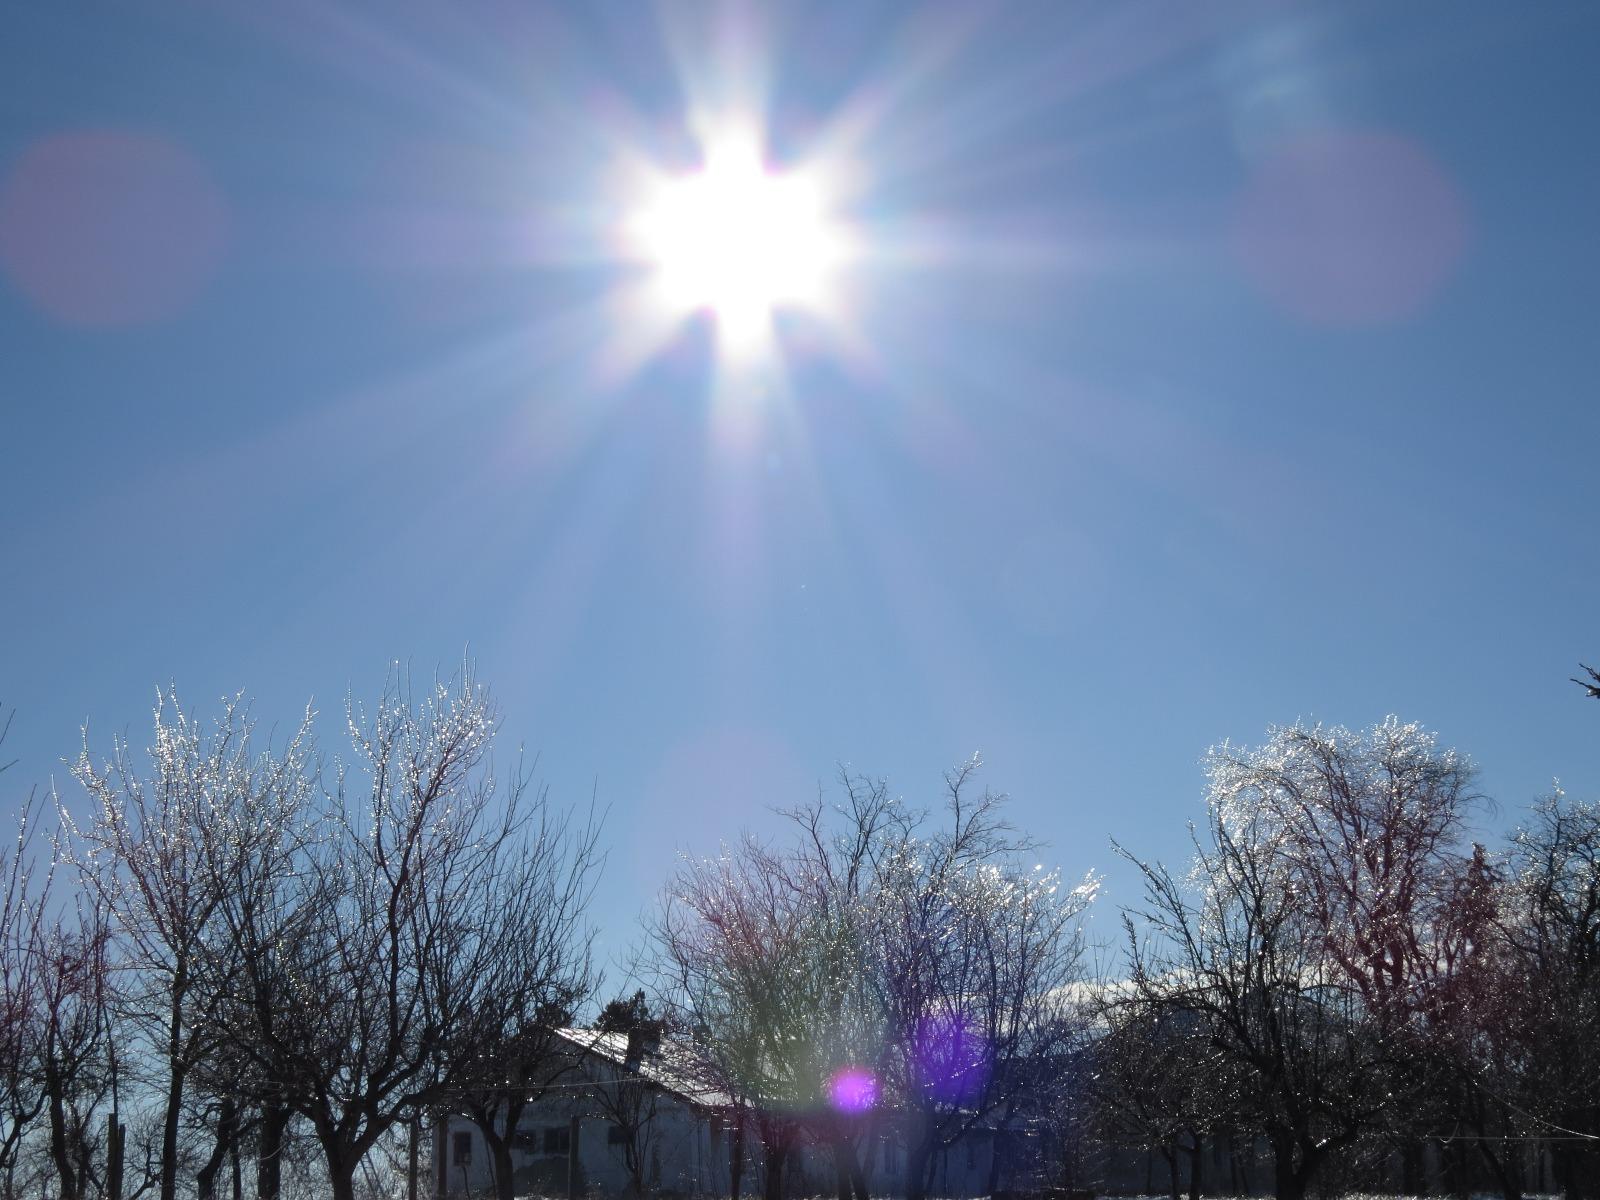 Soare stralucind stralucitor